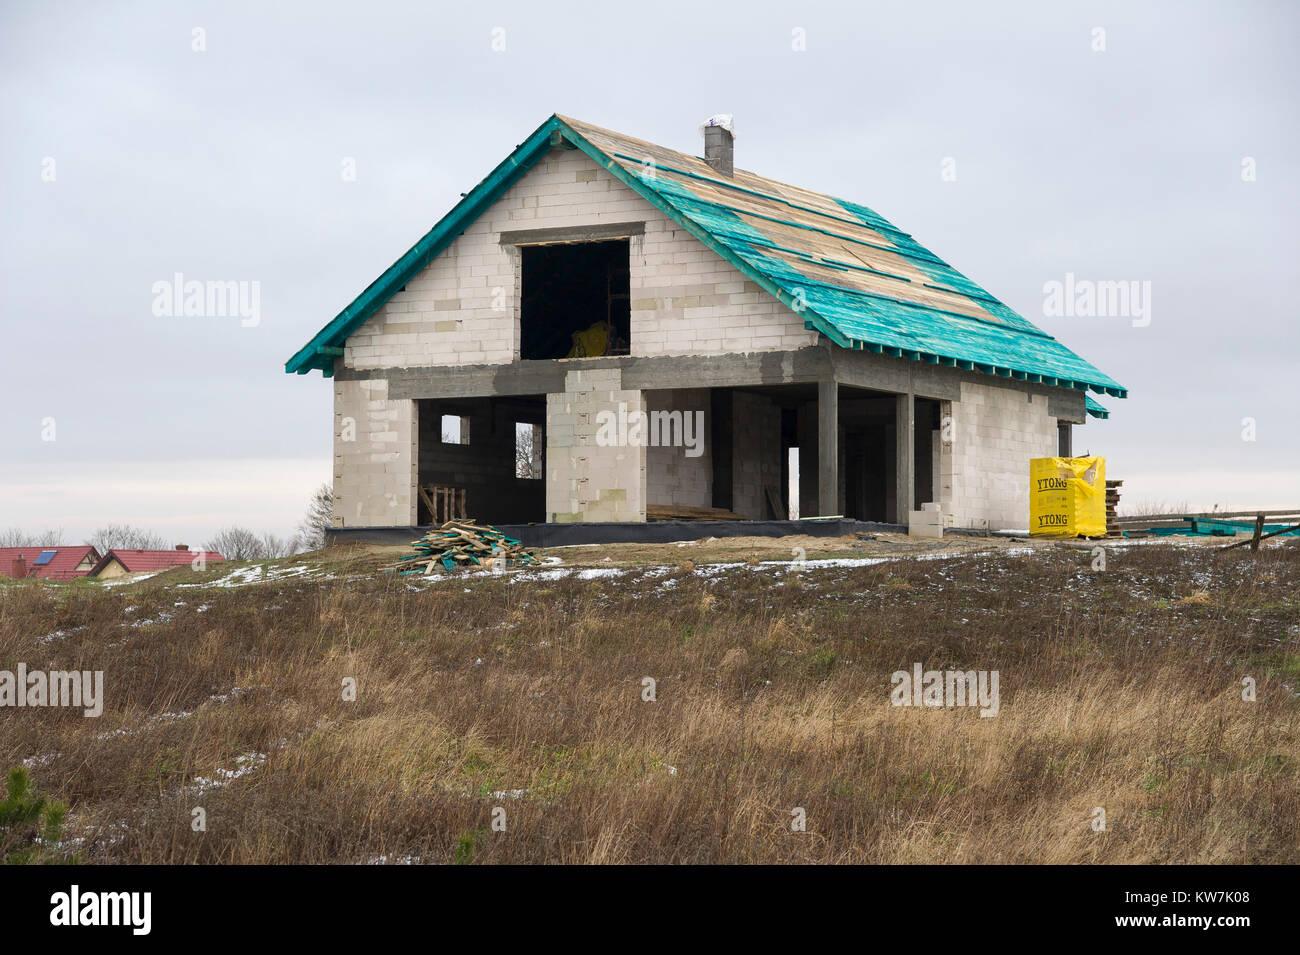 Single-family home under construction in Poland. 31 December 2017 © Wojciech Strozyk / Alamy Stock Photo - Stock Image